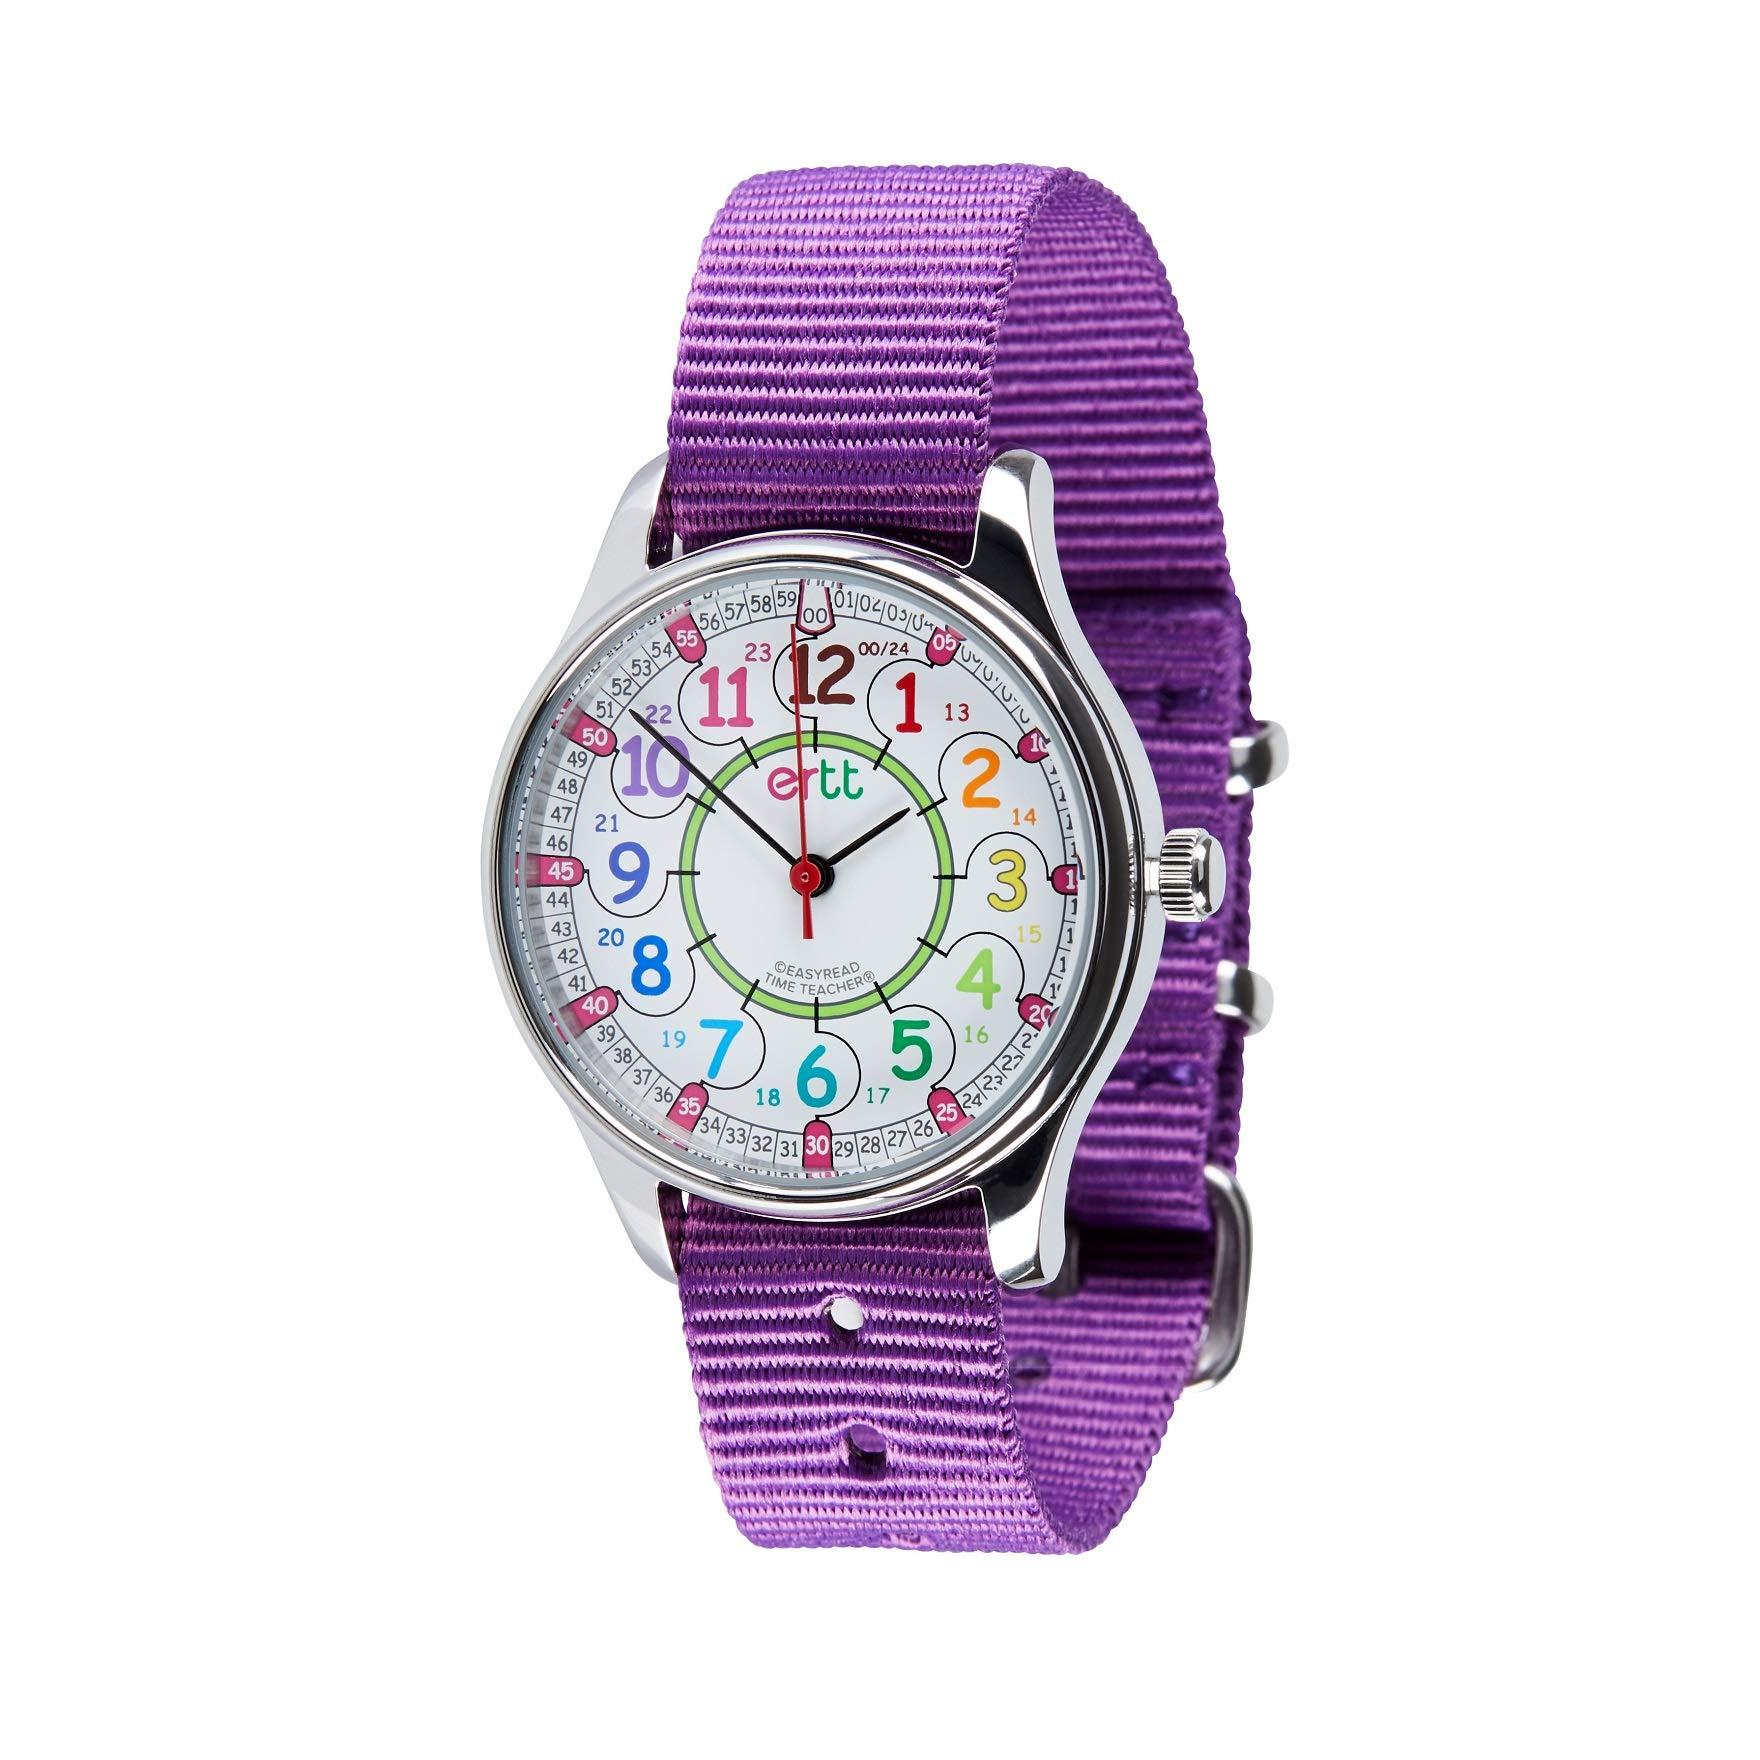 EasyRead Time Teacher WERW-COL-24-PU Rainbow 12/24 Hour Face Waterproof Watch Purple Strap by EasyRead Time Teacher